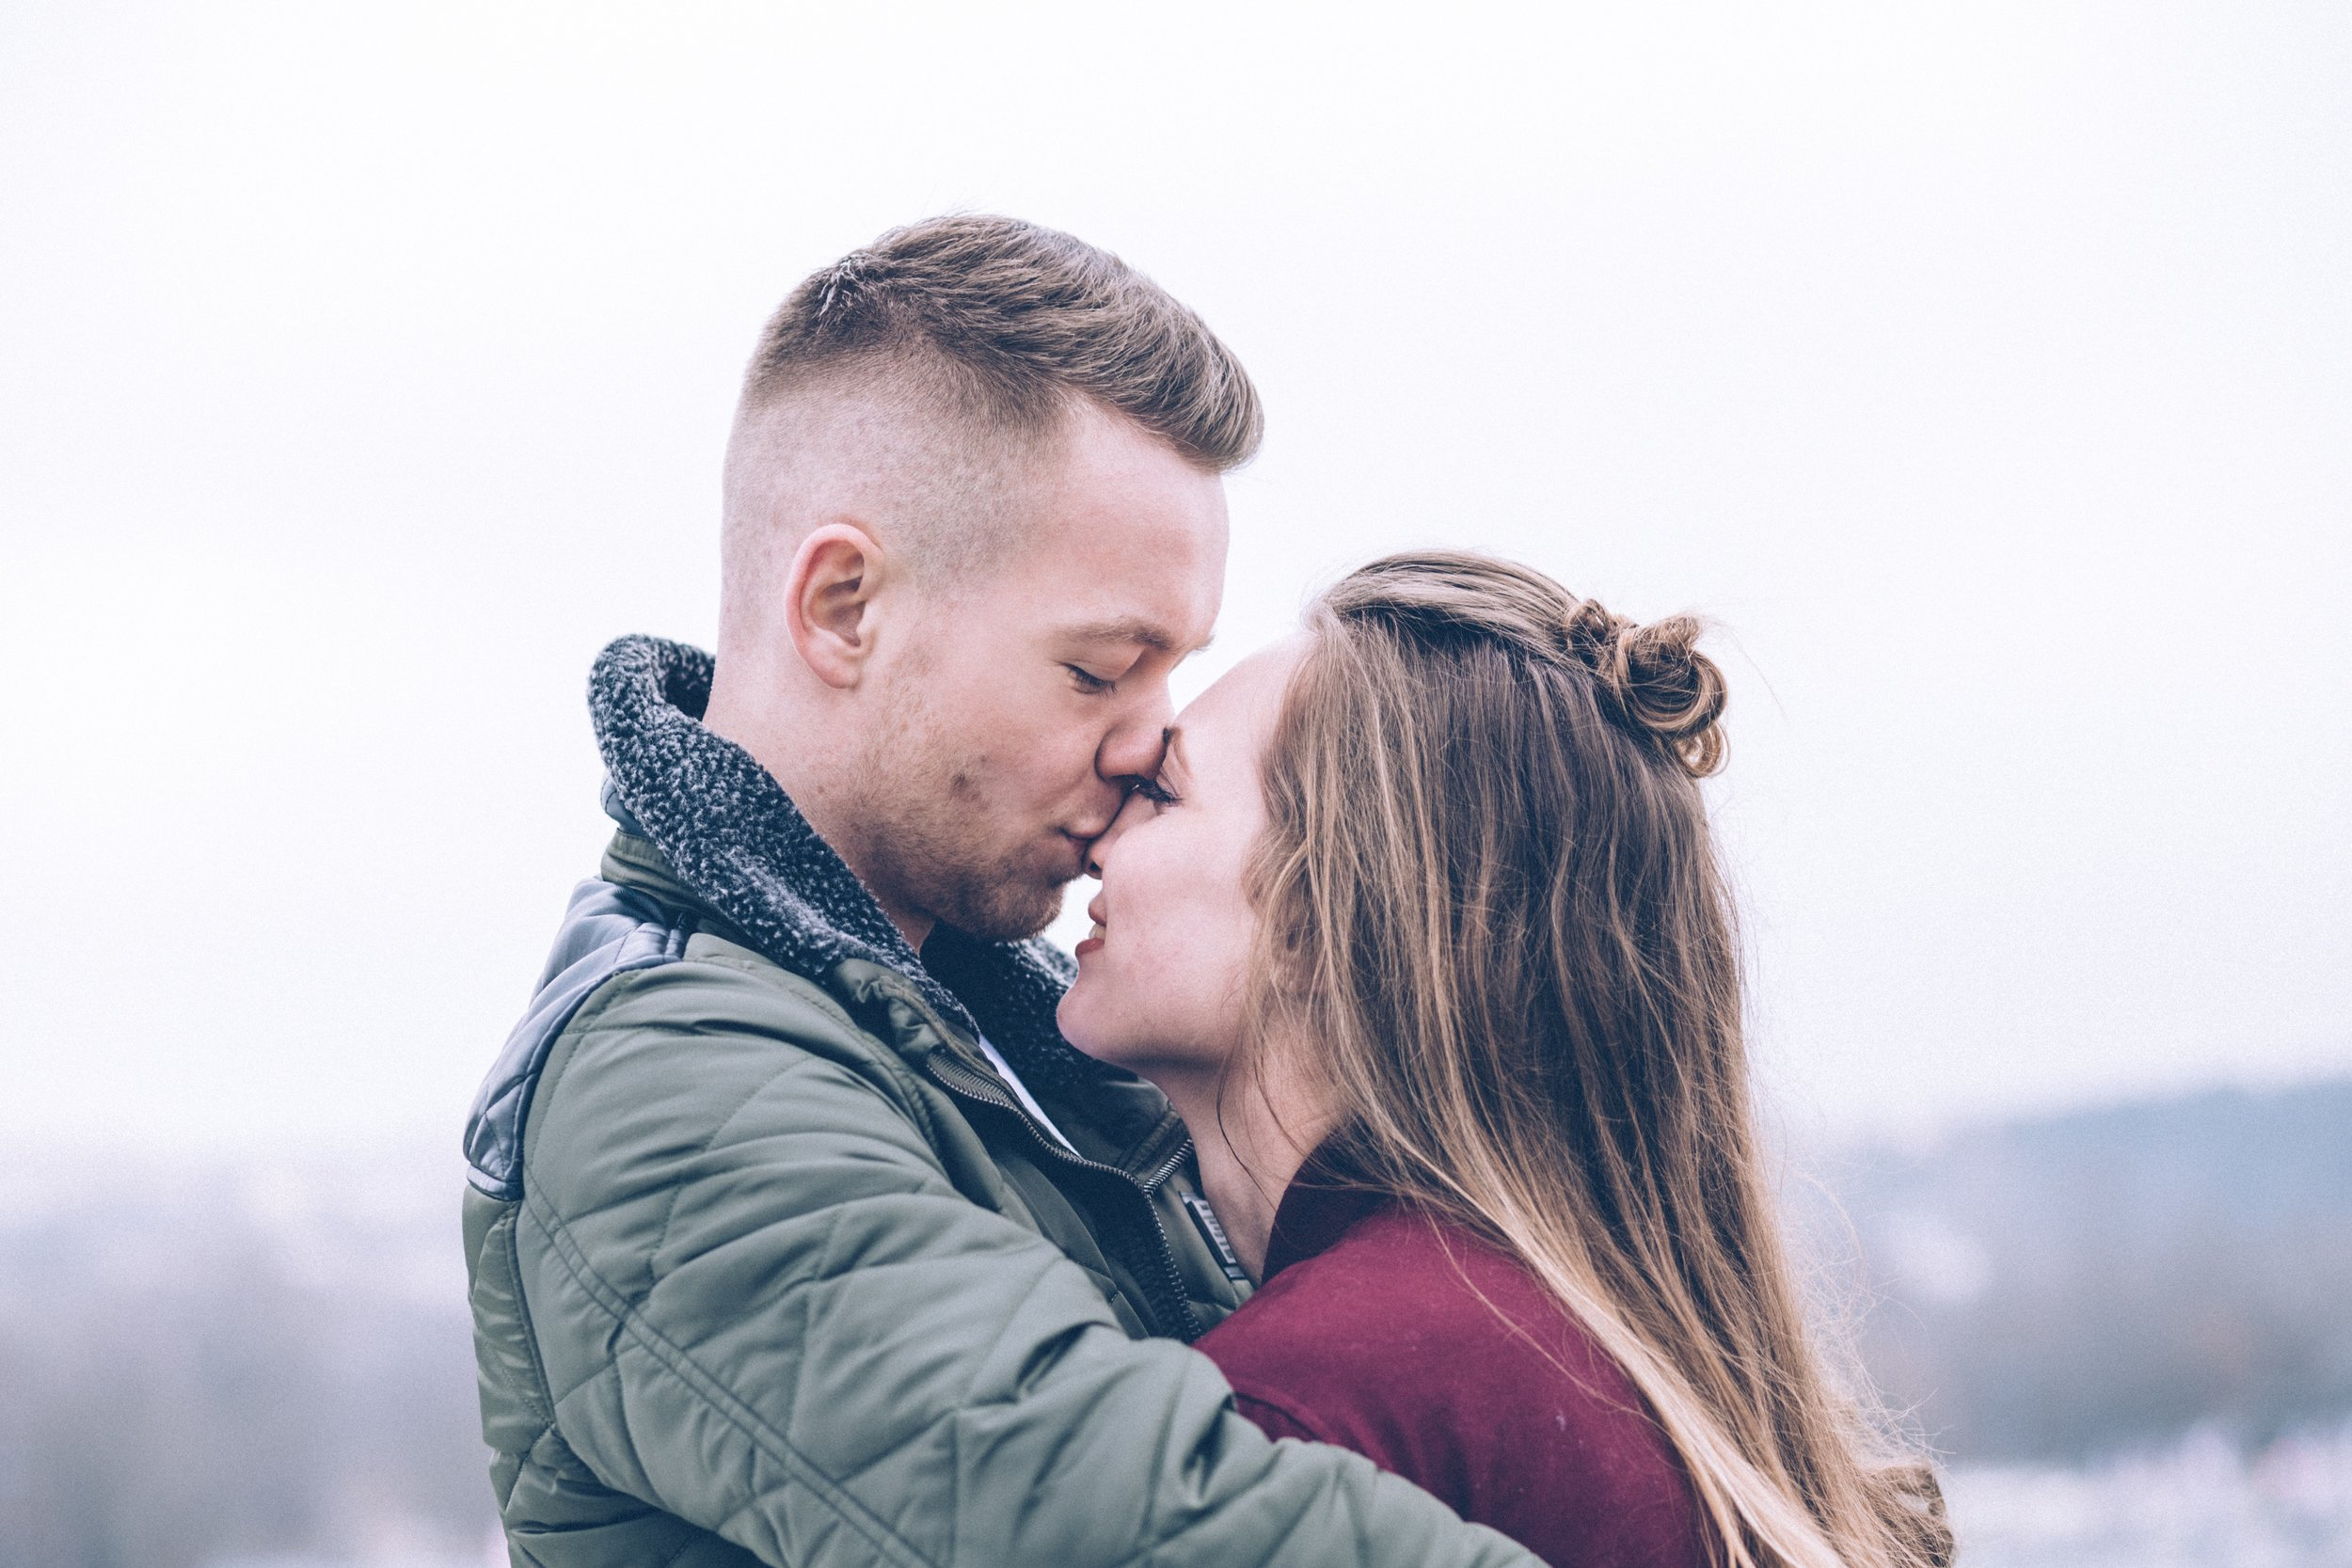 adult-affection-couple-399669.jpg